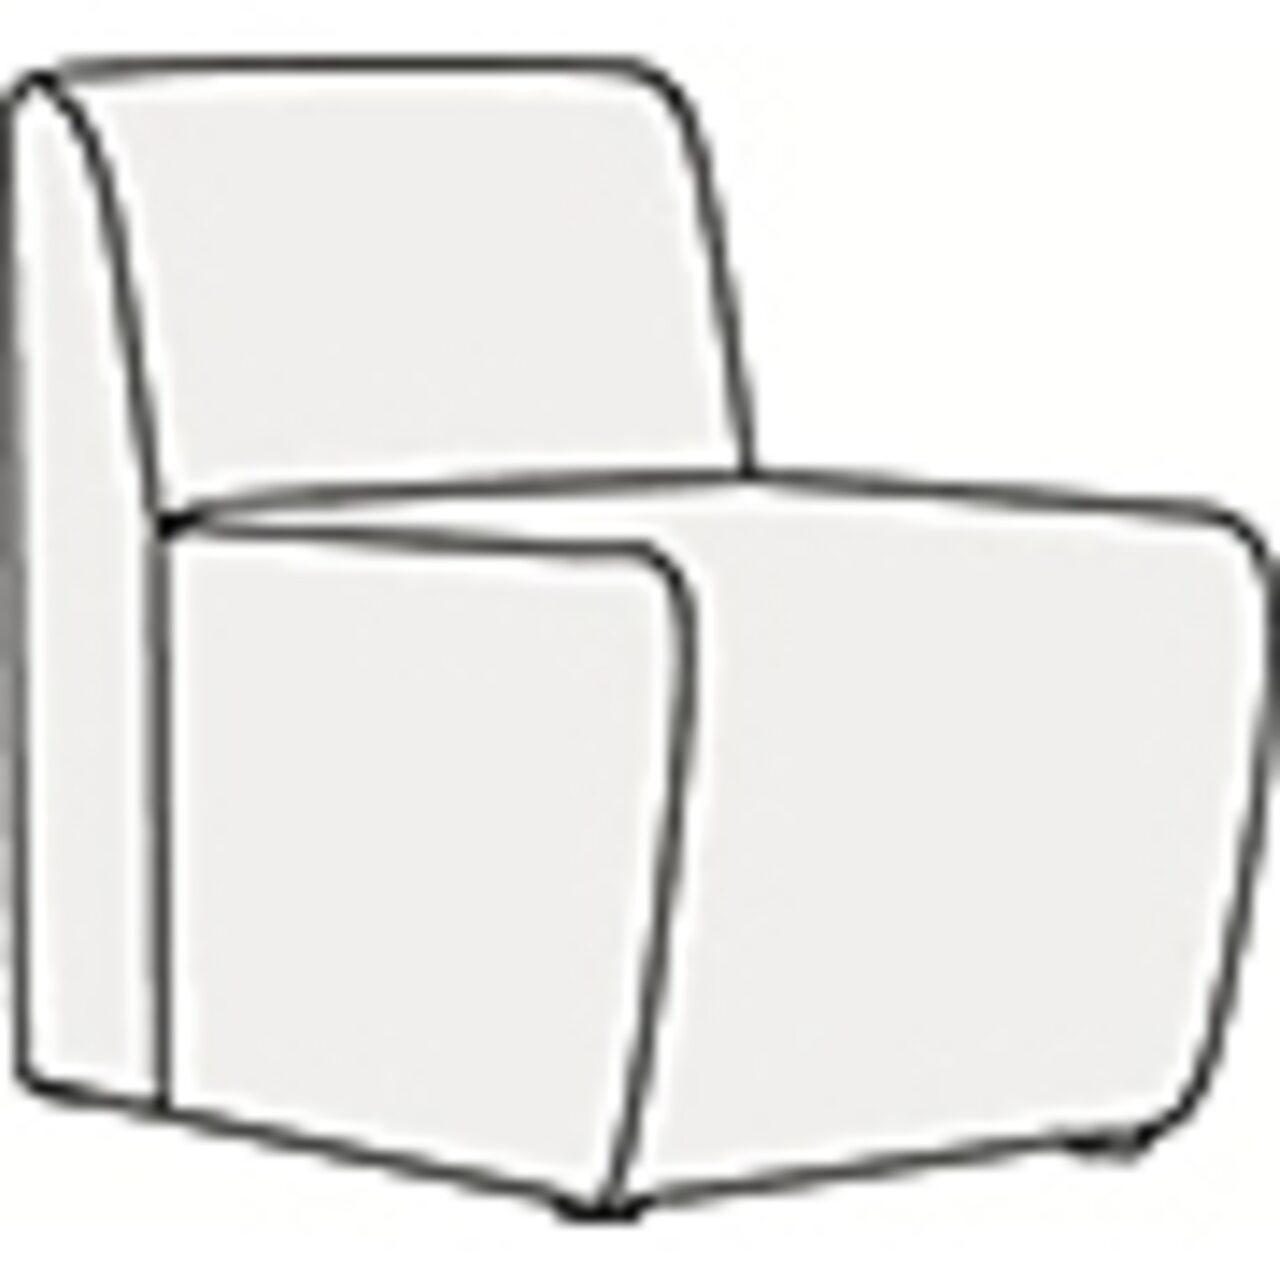 Кресло без подлокотников  ДУГЛАС 55x66x74 - фото 1